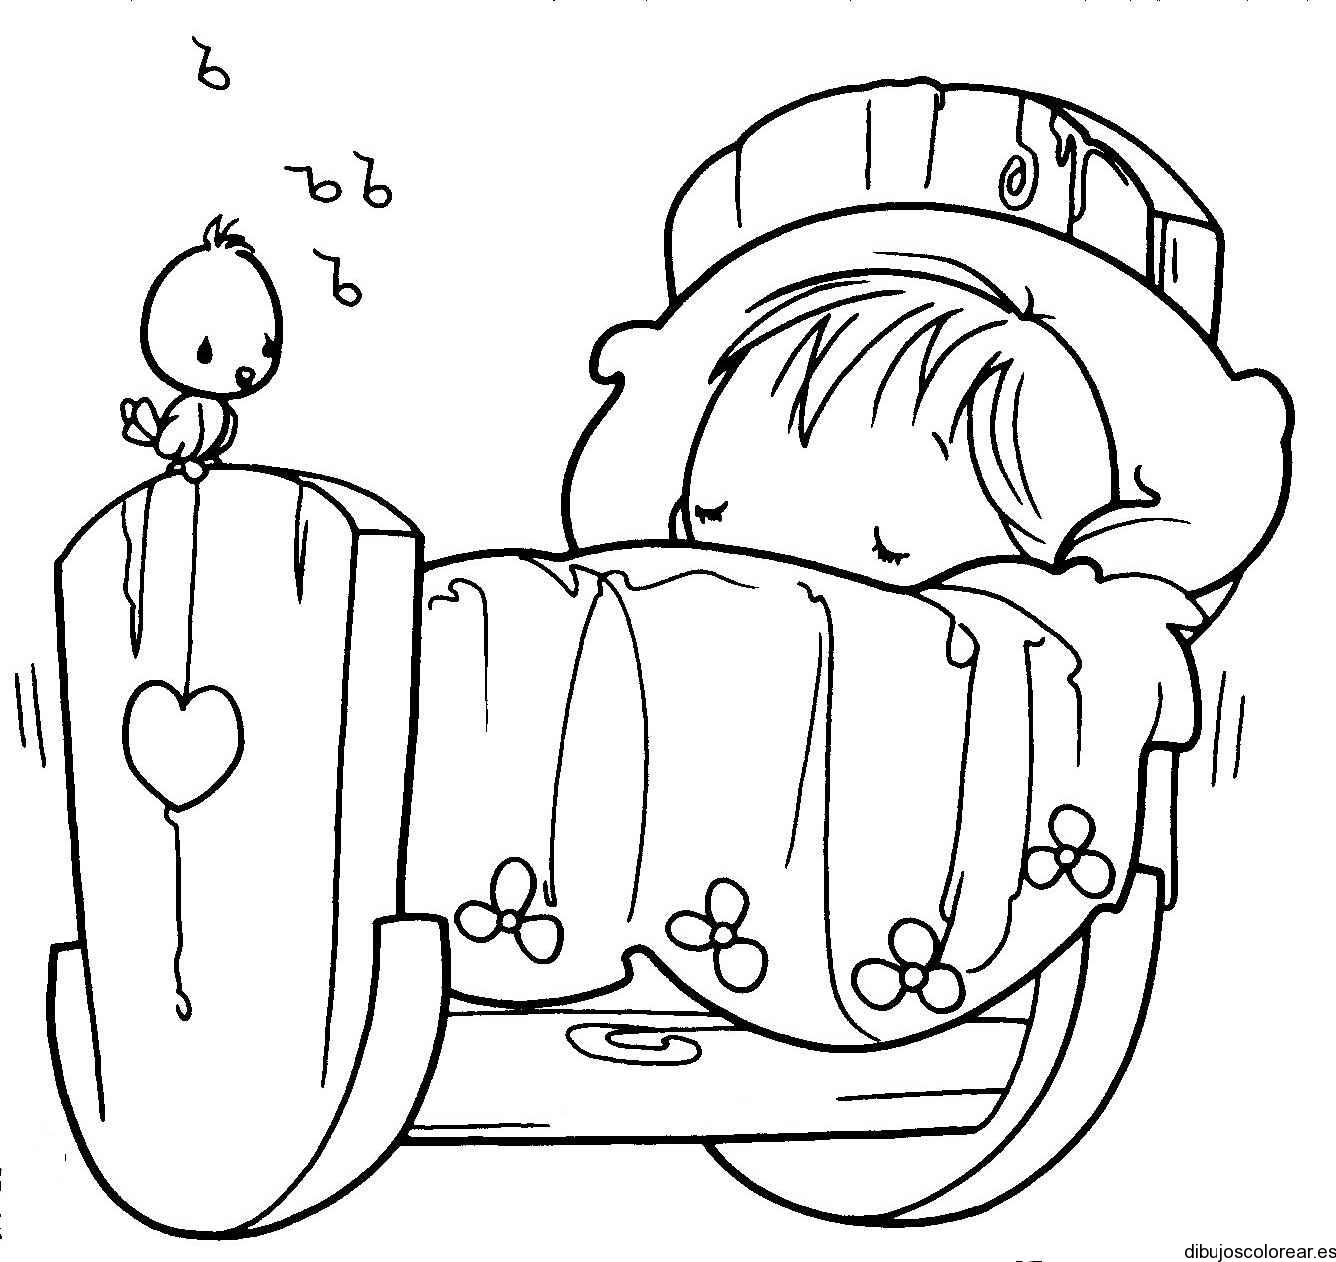 Dibujo de un bebé en la cuna